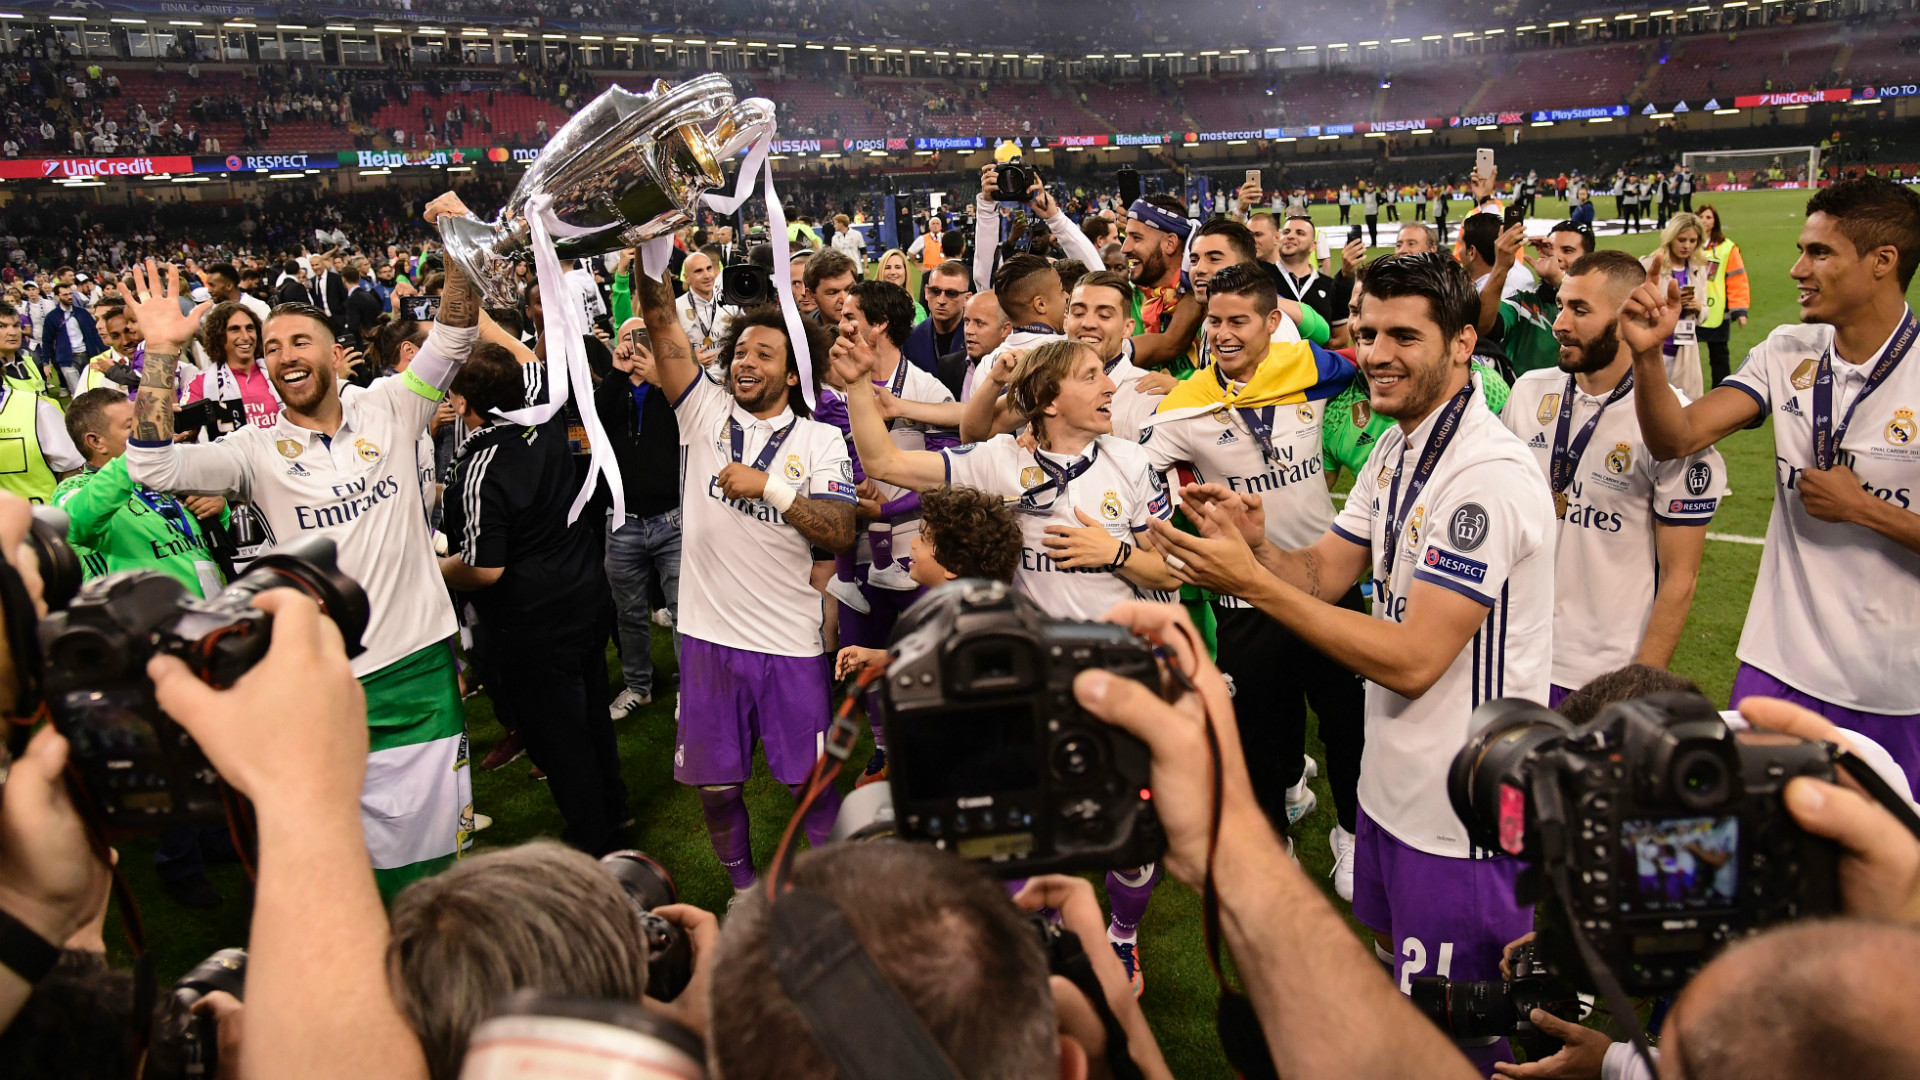 Mediaset: niente partite della Juventus in chiaro durante i gironi di Champions